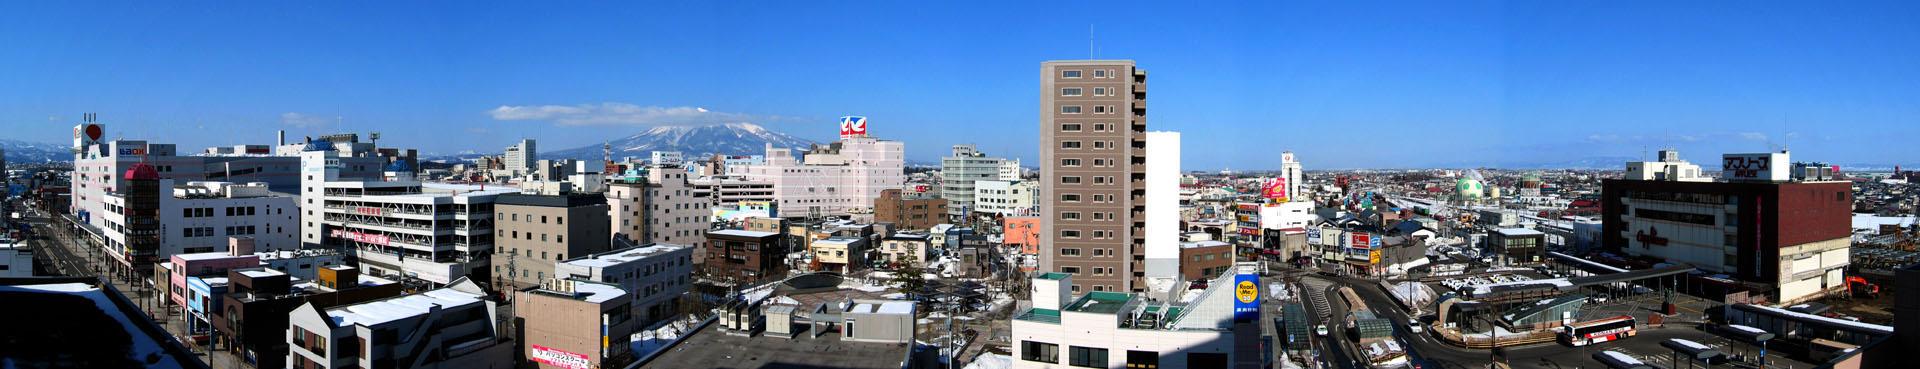 Hirosaki Japan Hirosaki Japan